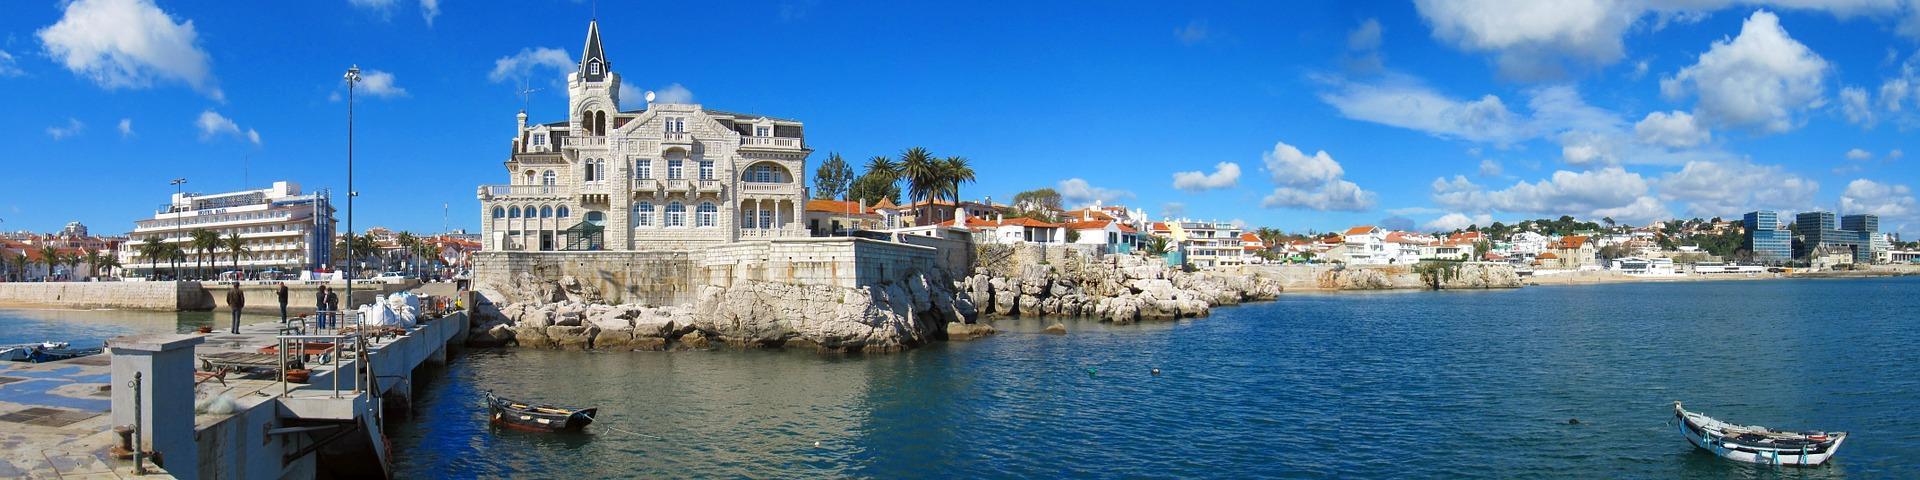 luxury real estate in portugal jpg - Элитная недвижимость в Португалии